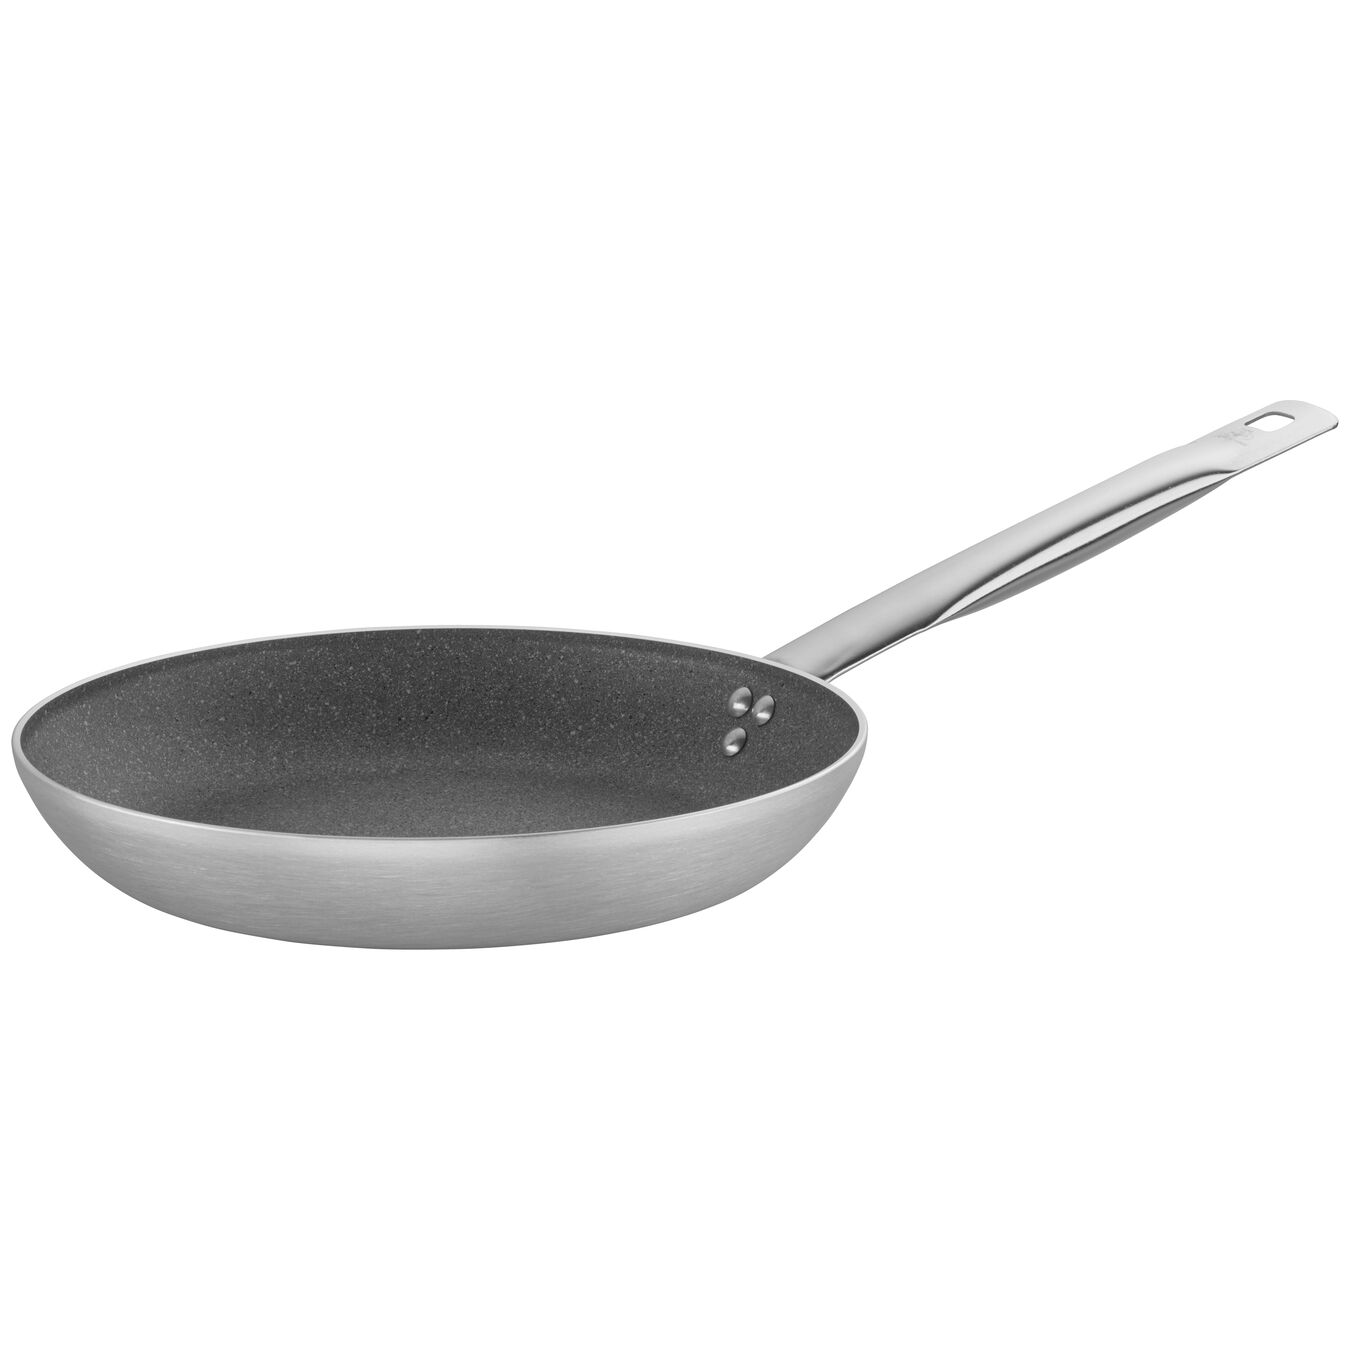 11-inch Fry Pan,,large 1